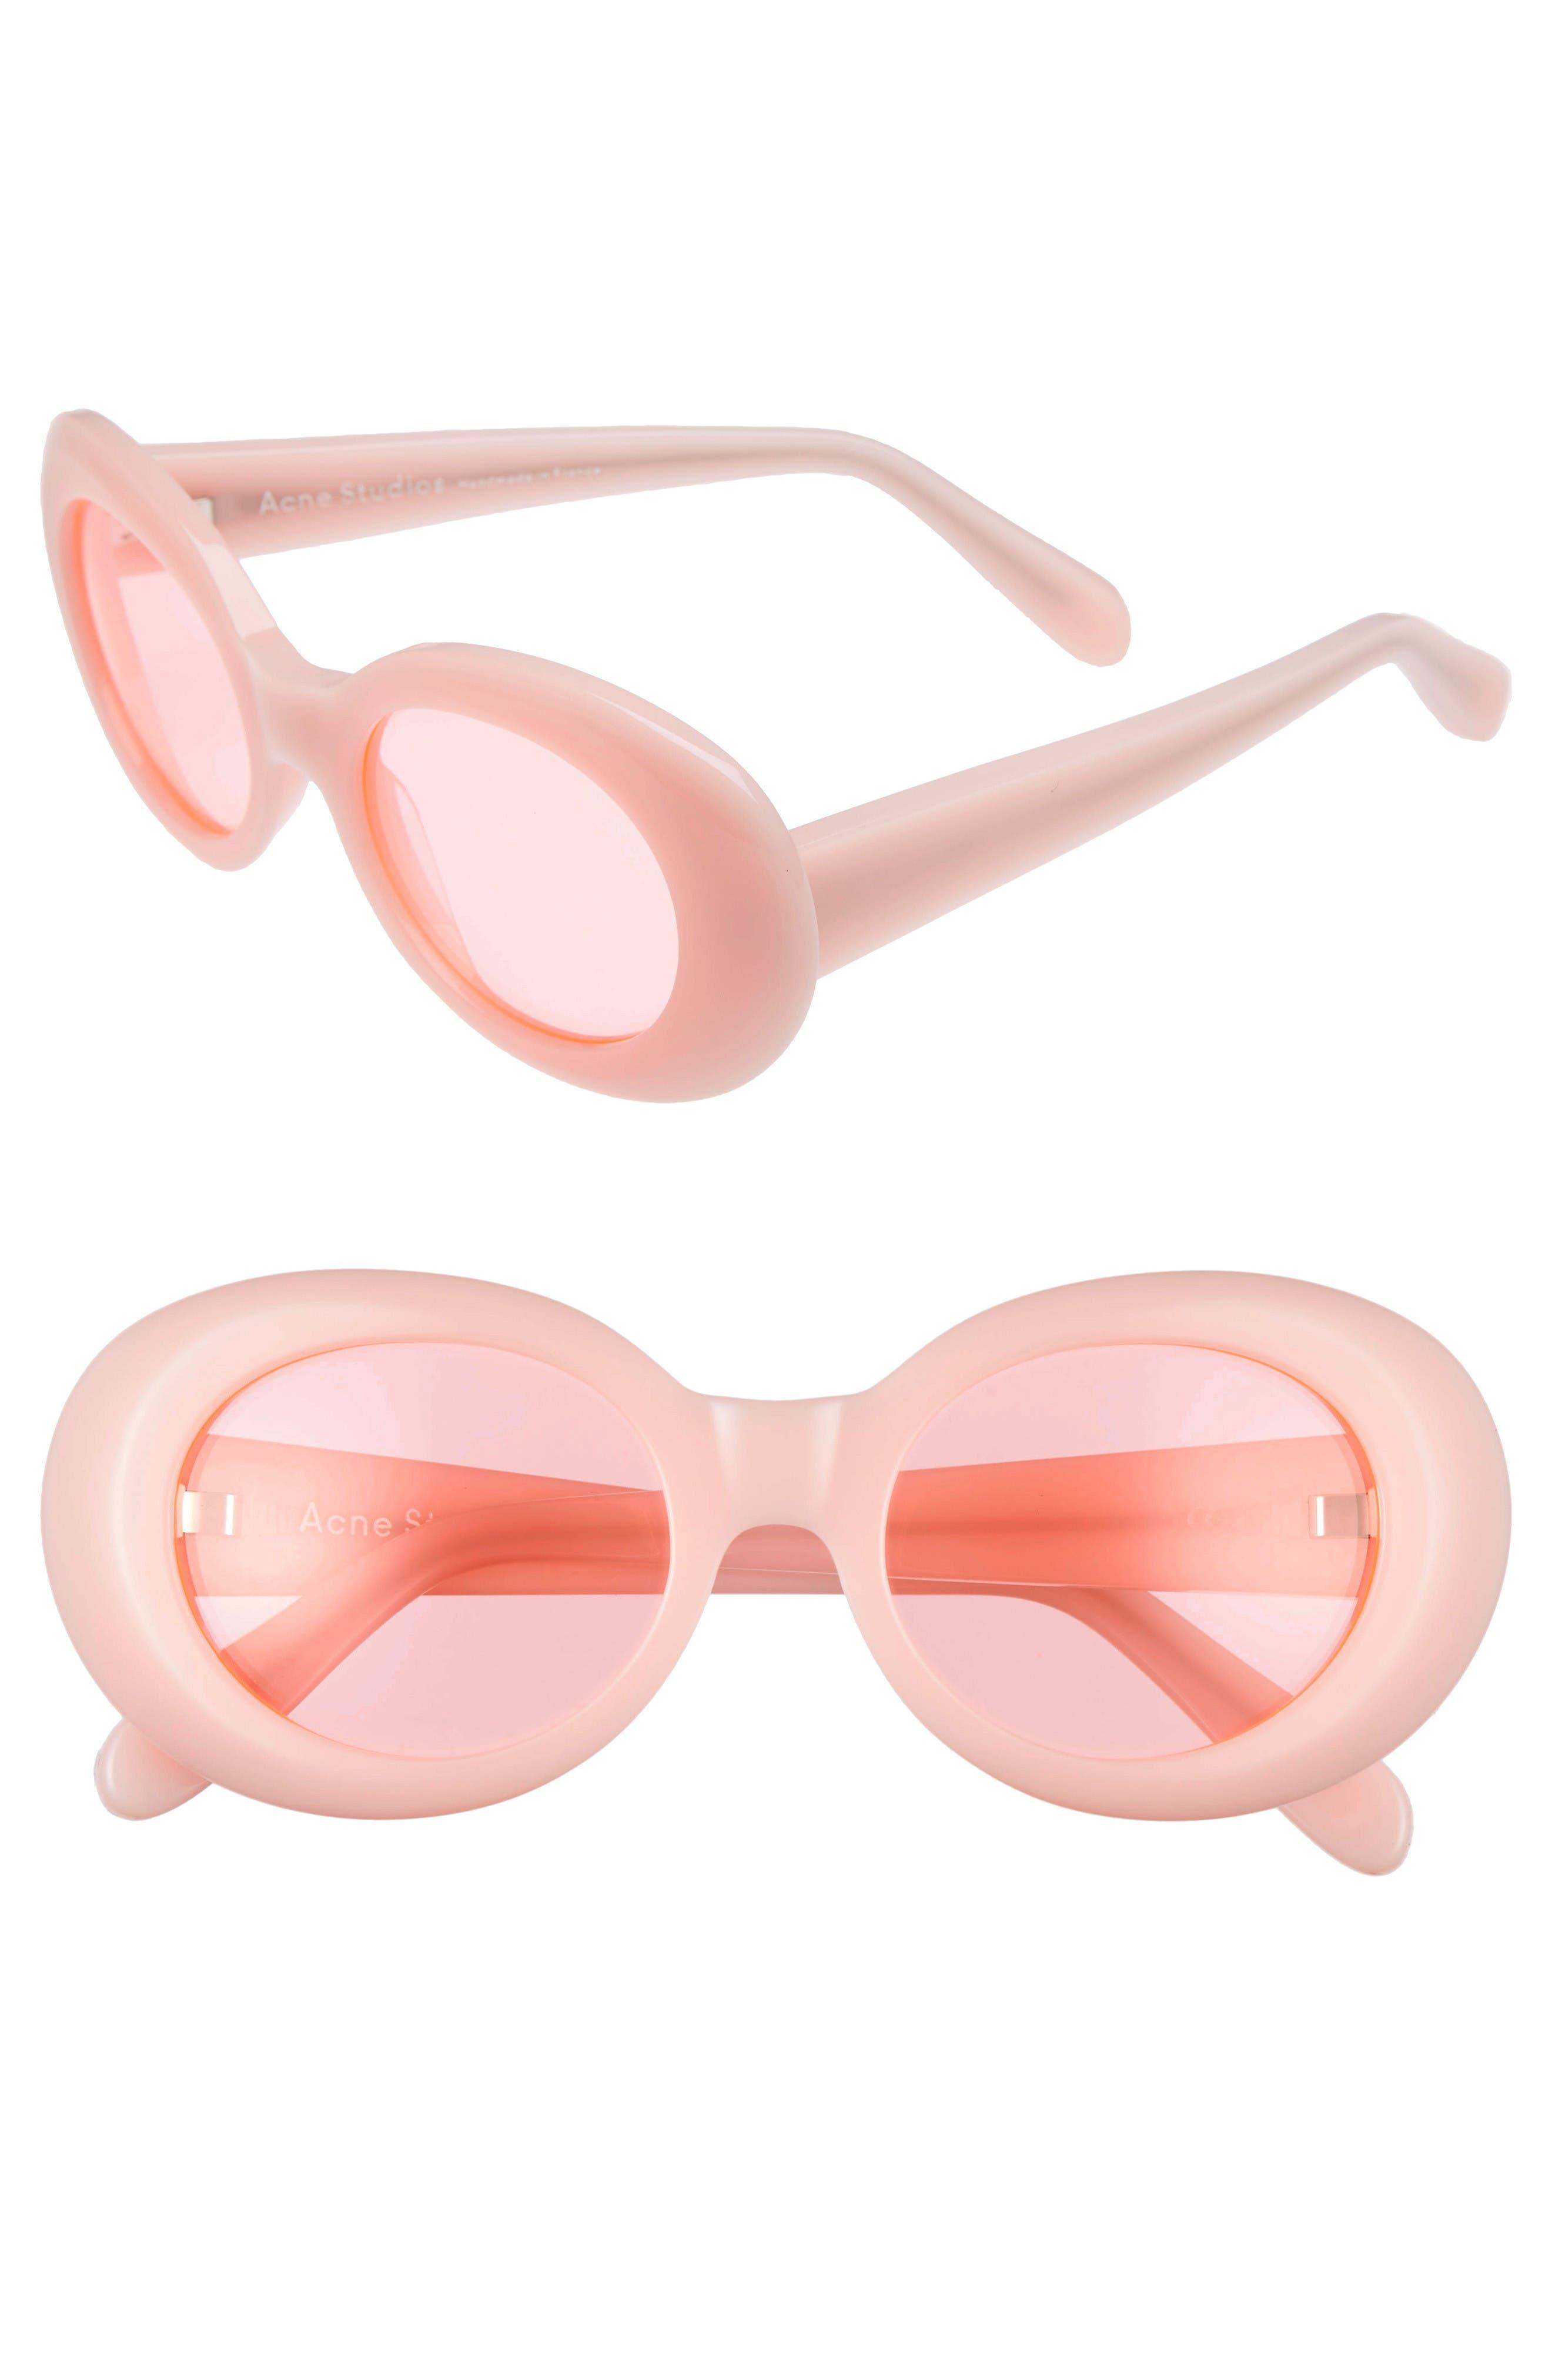 Main Image - ACNE Studios Mustang 47mm Oval Sunglasses